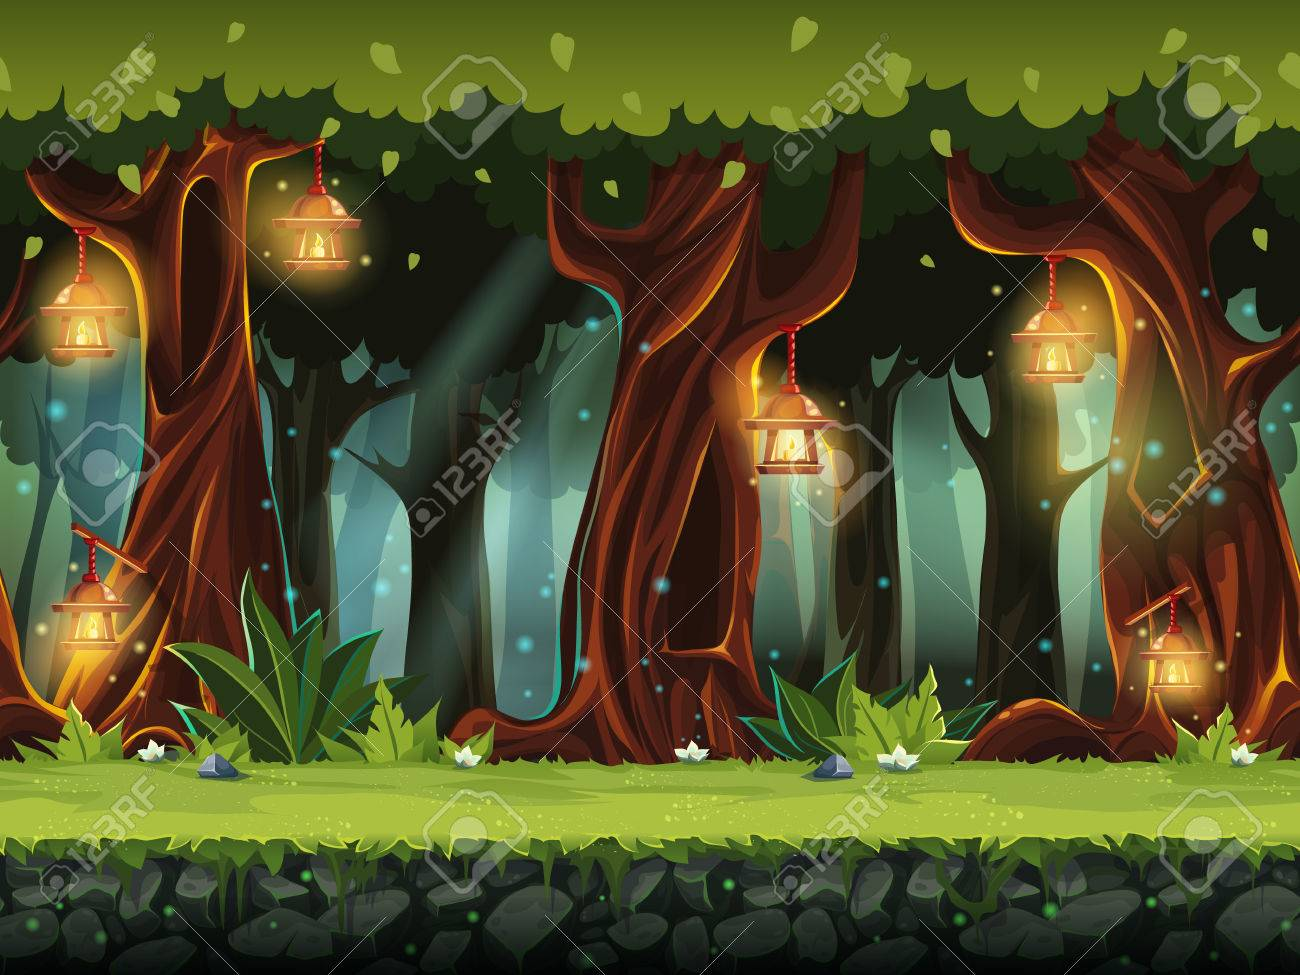 Vector cartoon illustration of the fairy forest. - 71567087